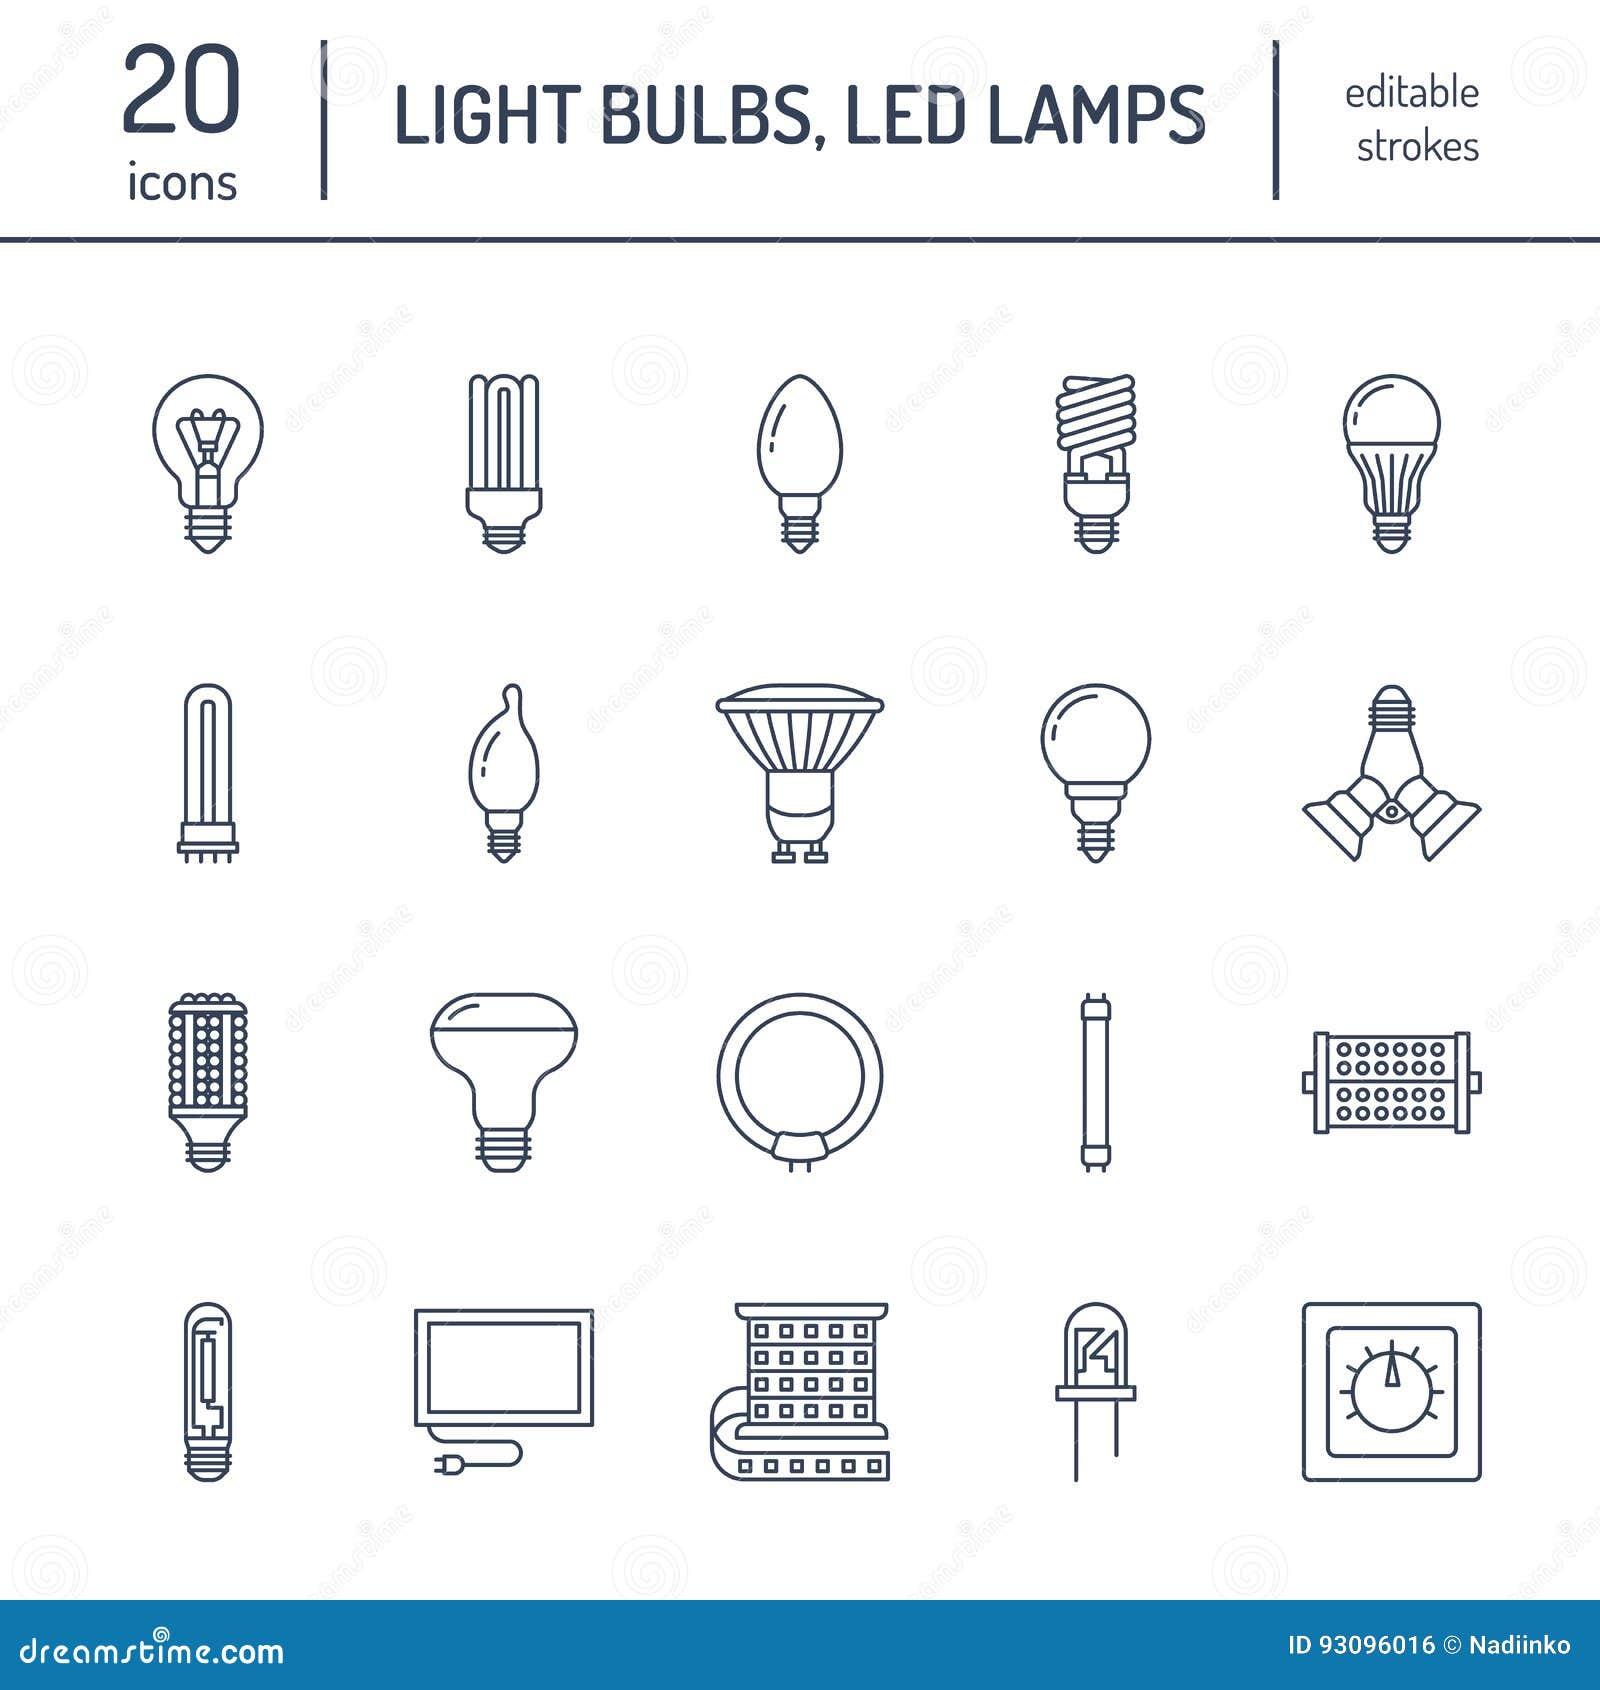 ligne plate ic nes d 39 ampoules types de lampes fluorescent men s filament halog ne diode et. Black Bedroom Furniture Sets. Home Design Ideas